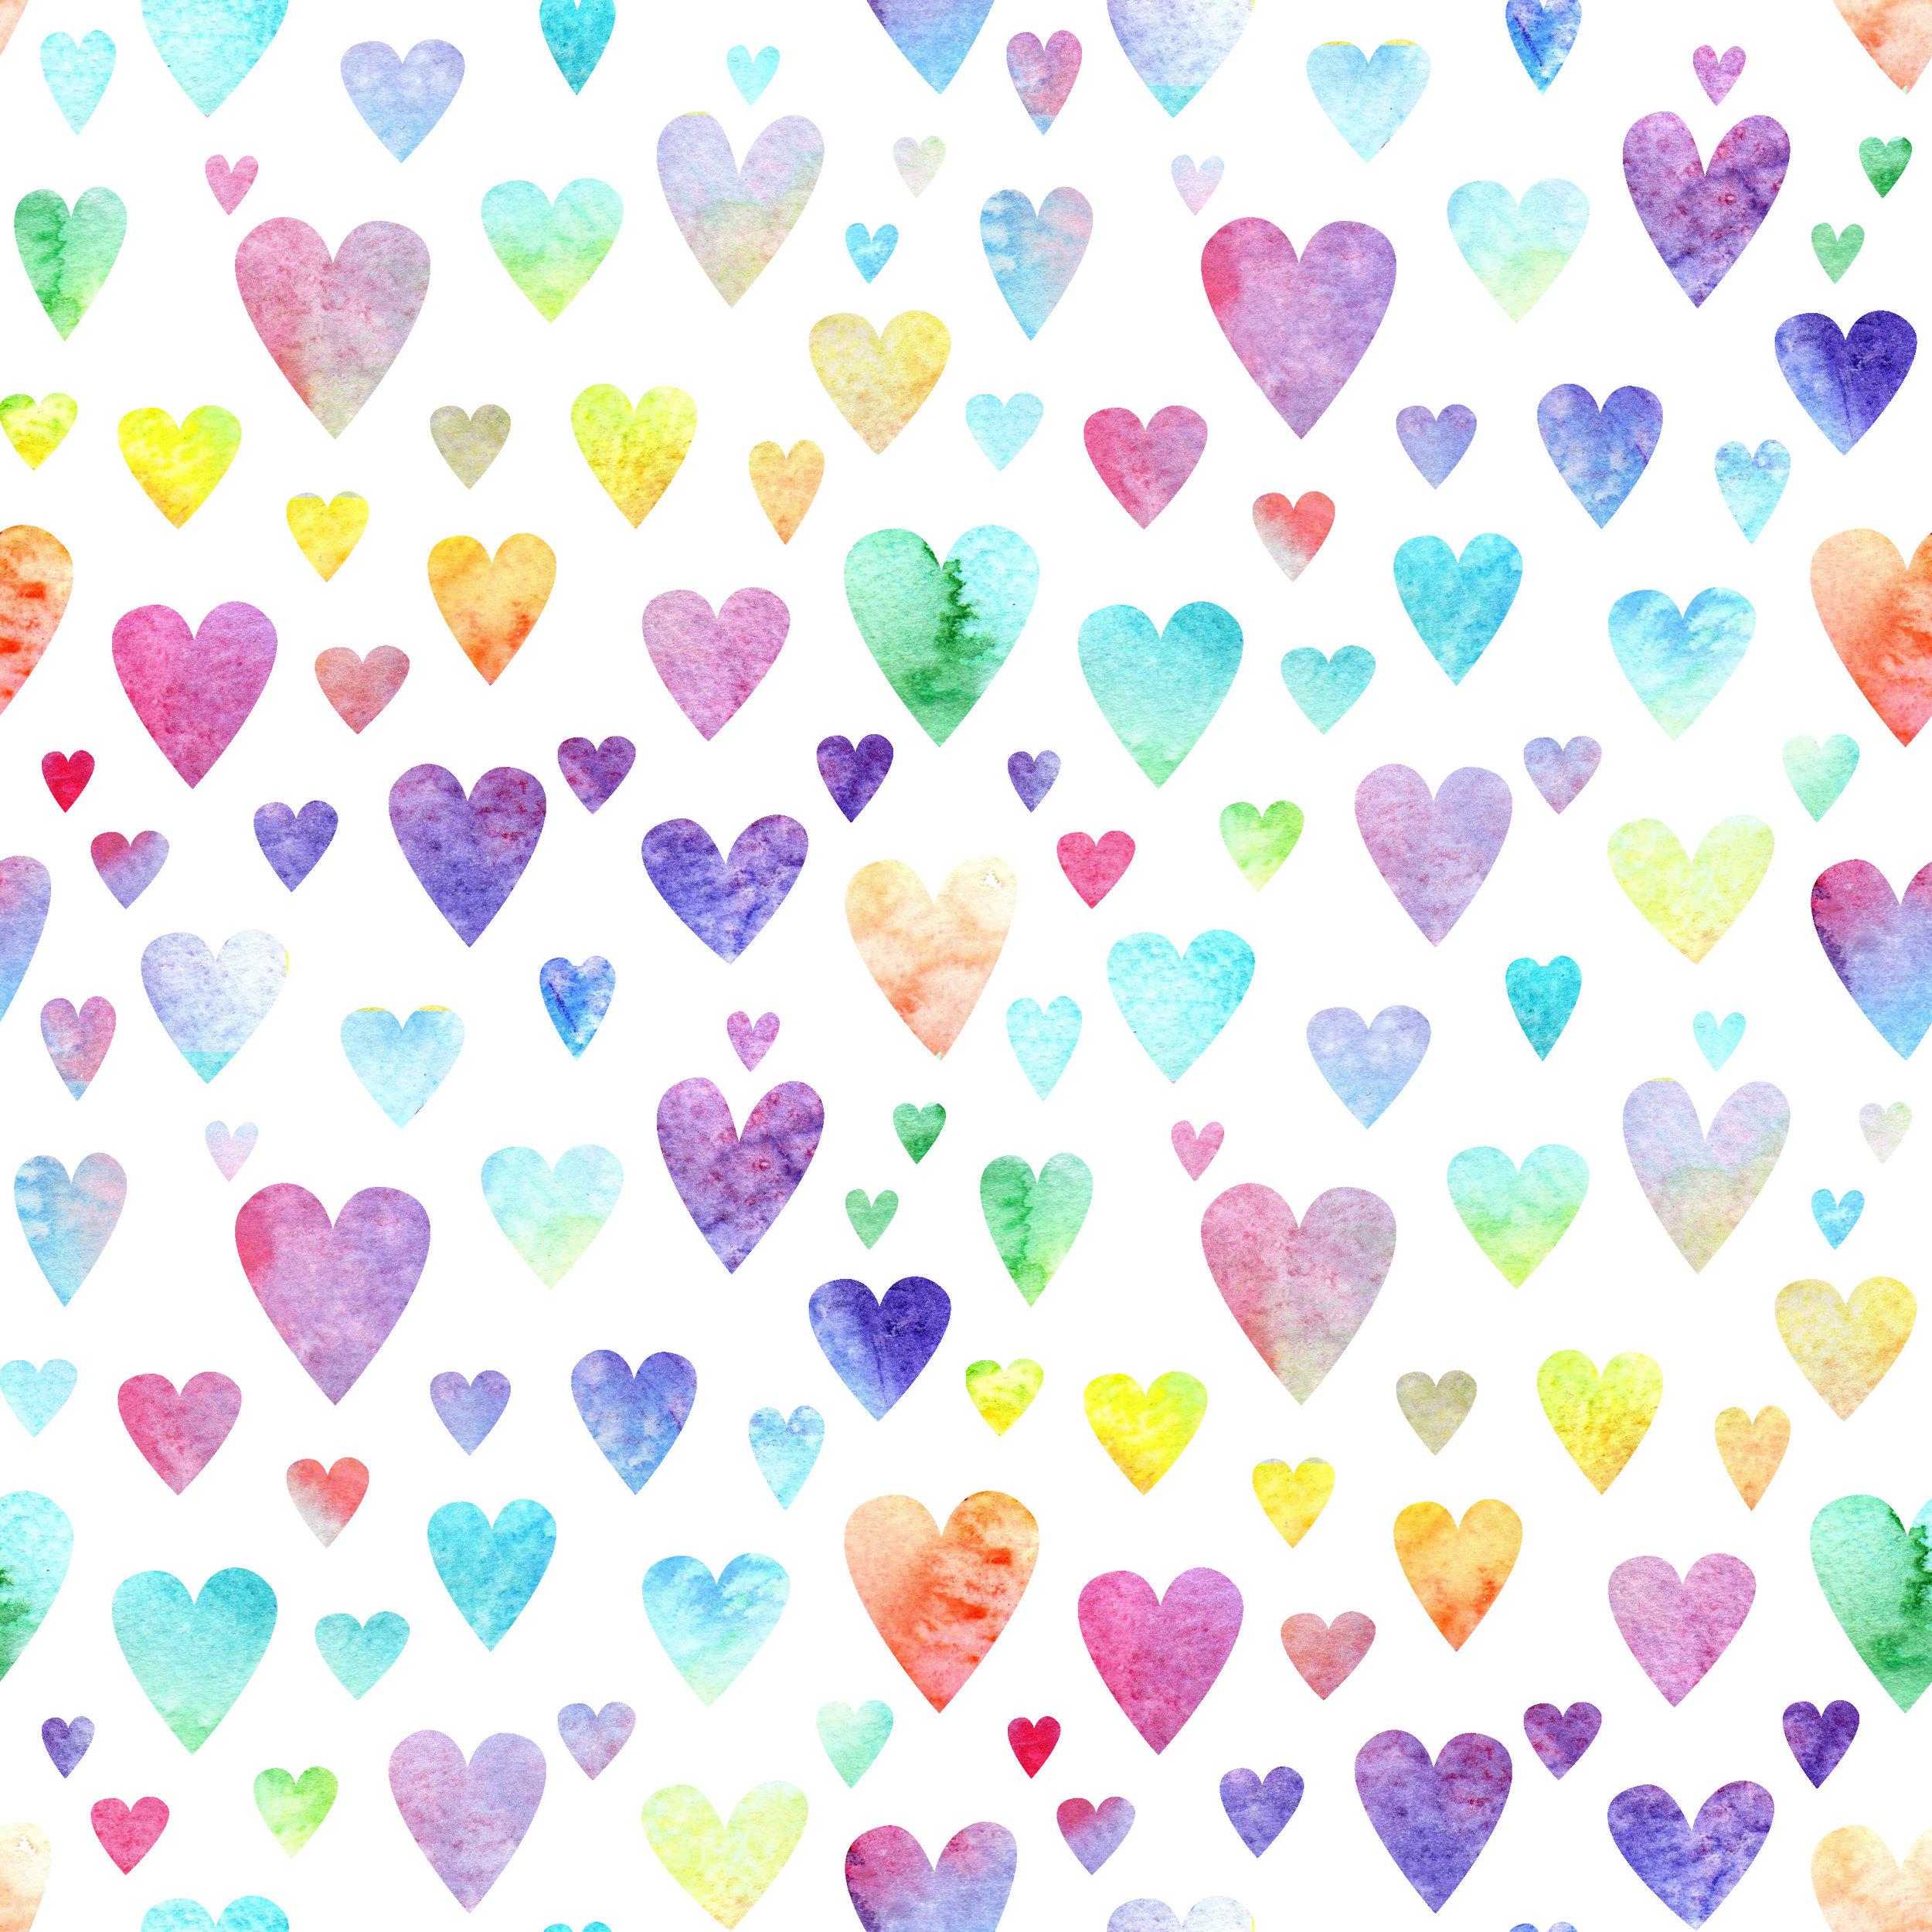 hearts watercolour rainbow.jpg